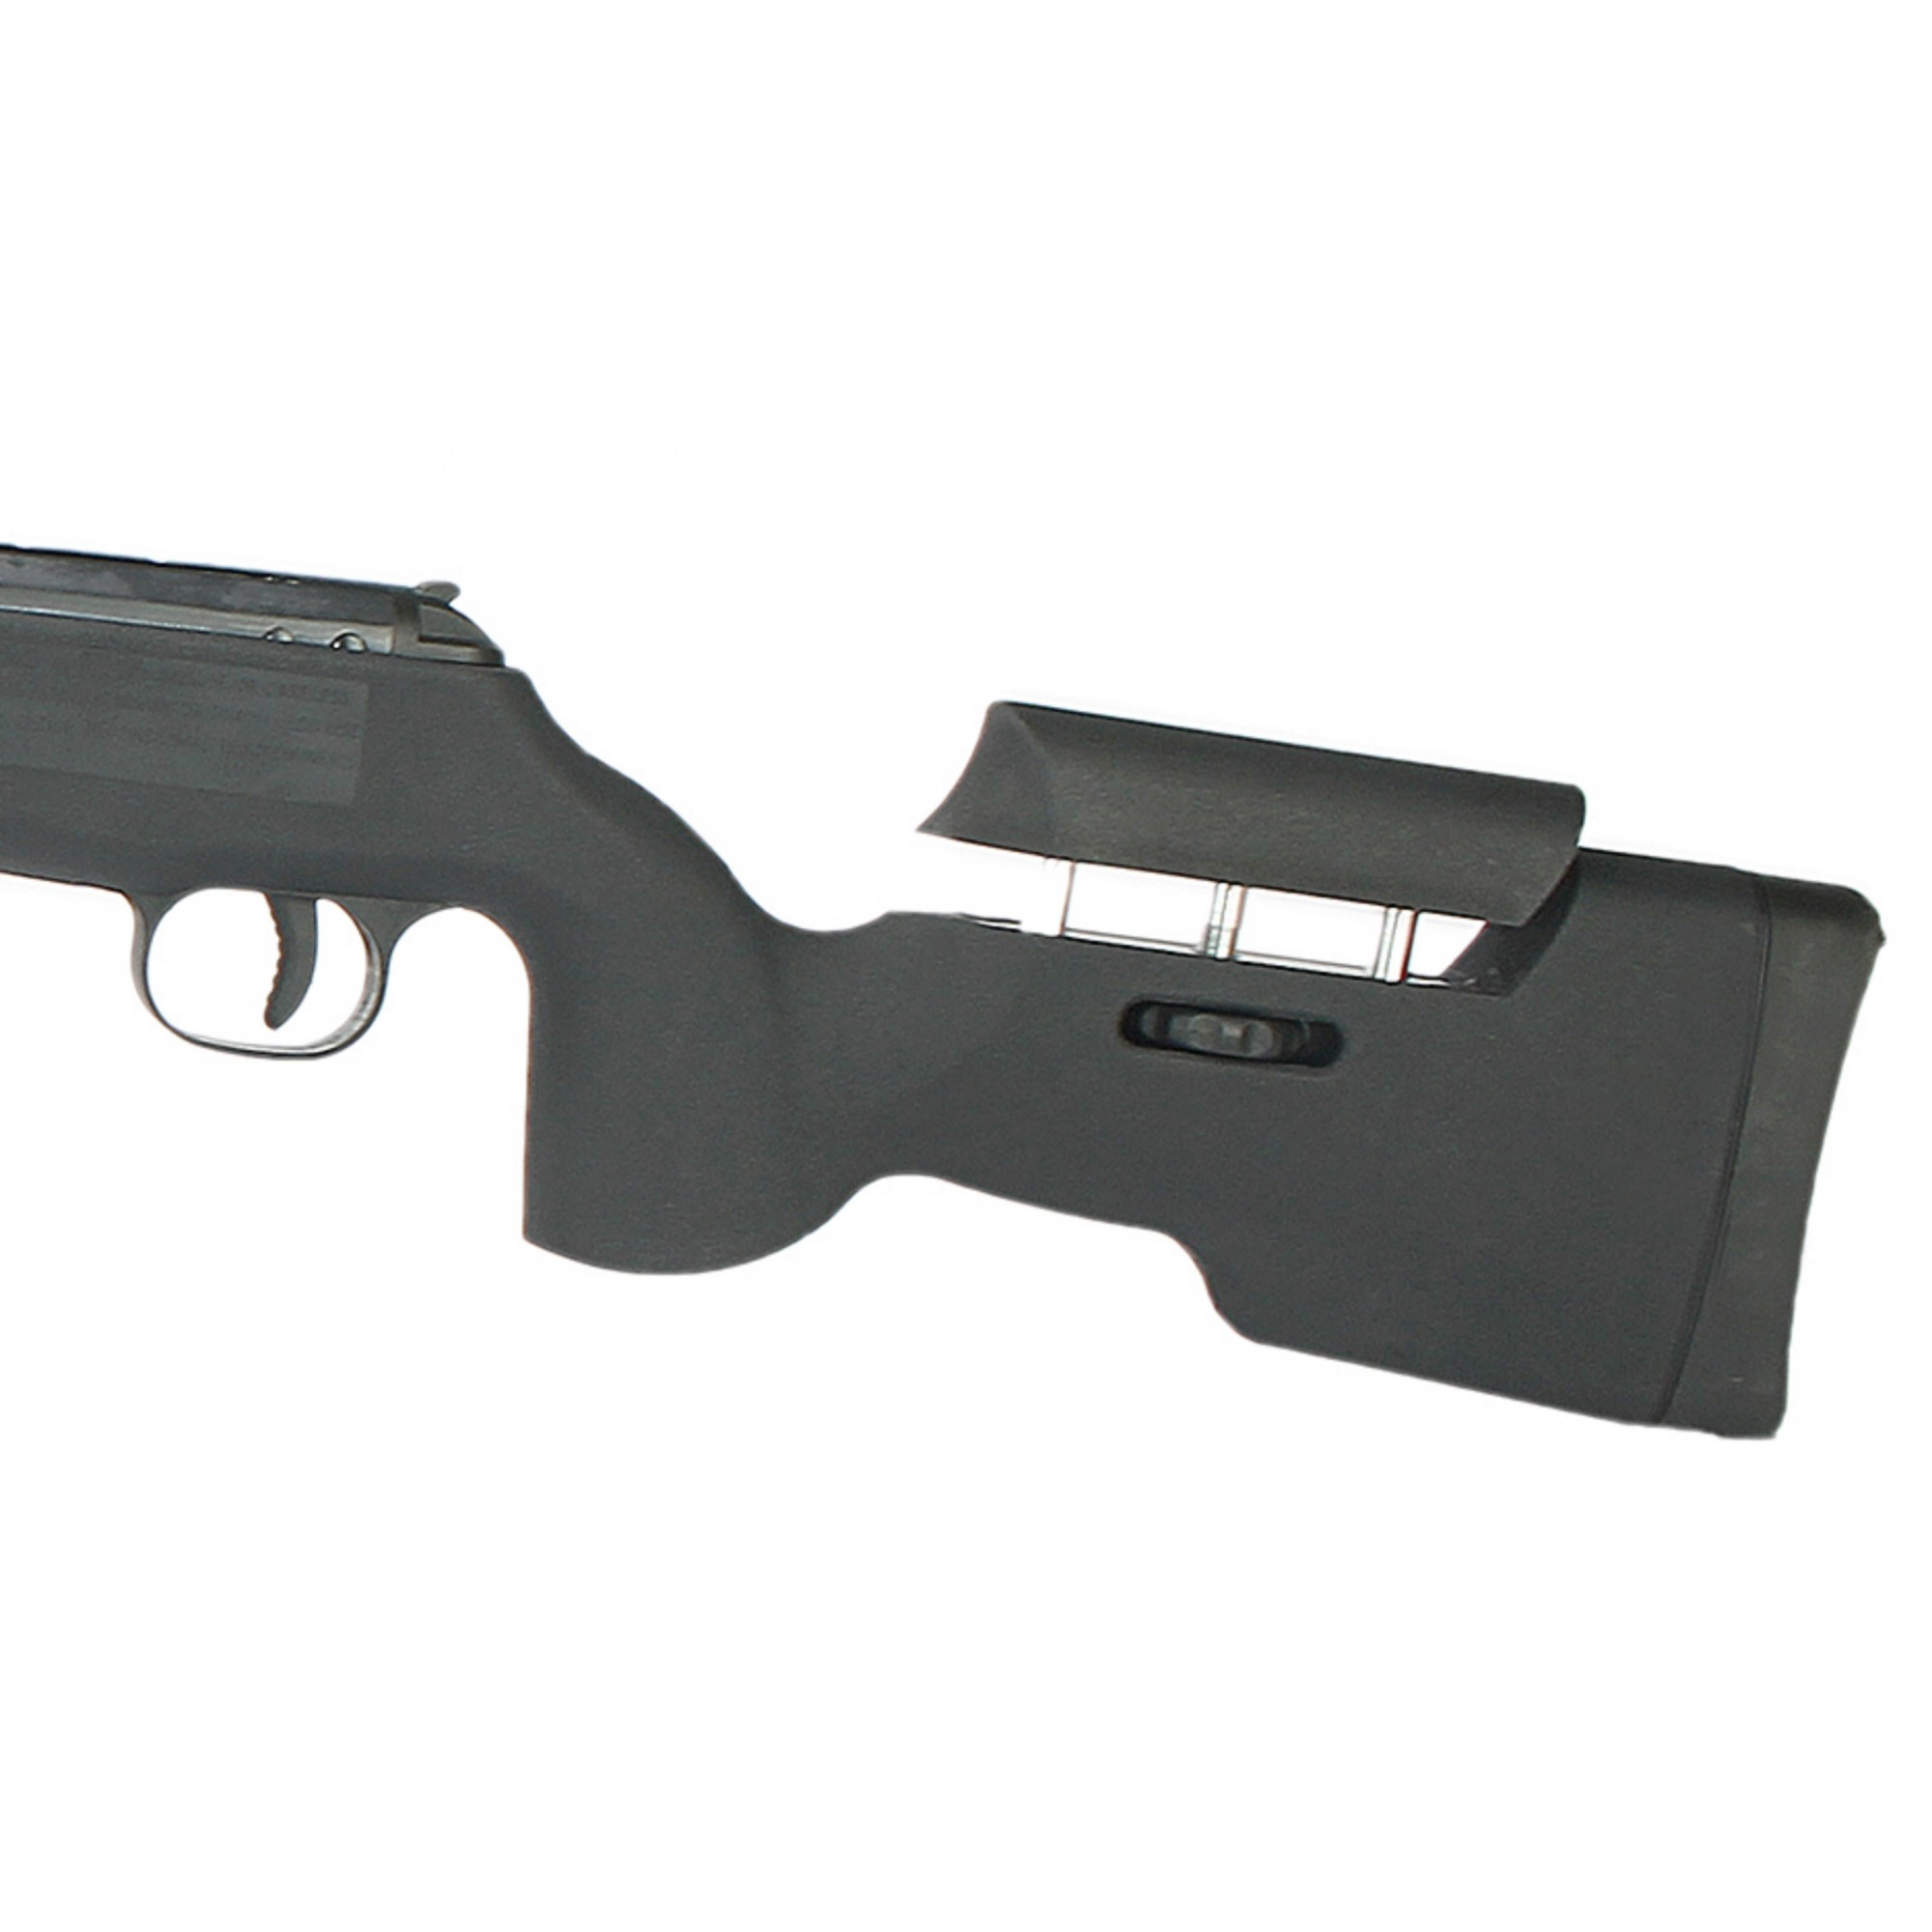 Carabina de Pressão Artemis 5.5mm GP Sniper 1250